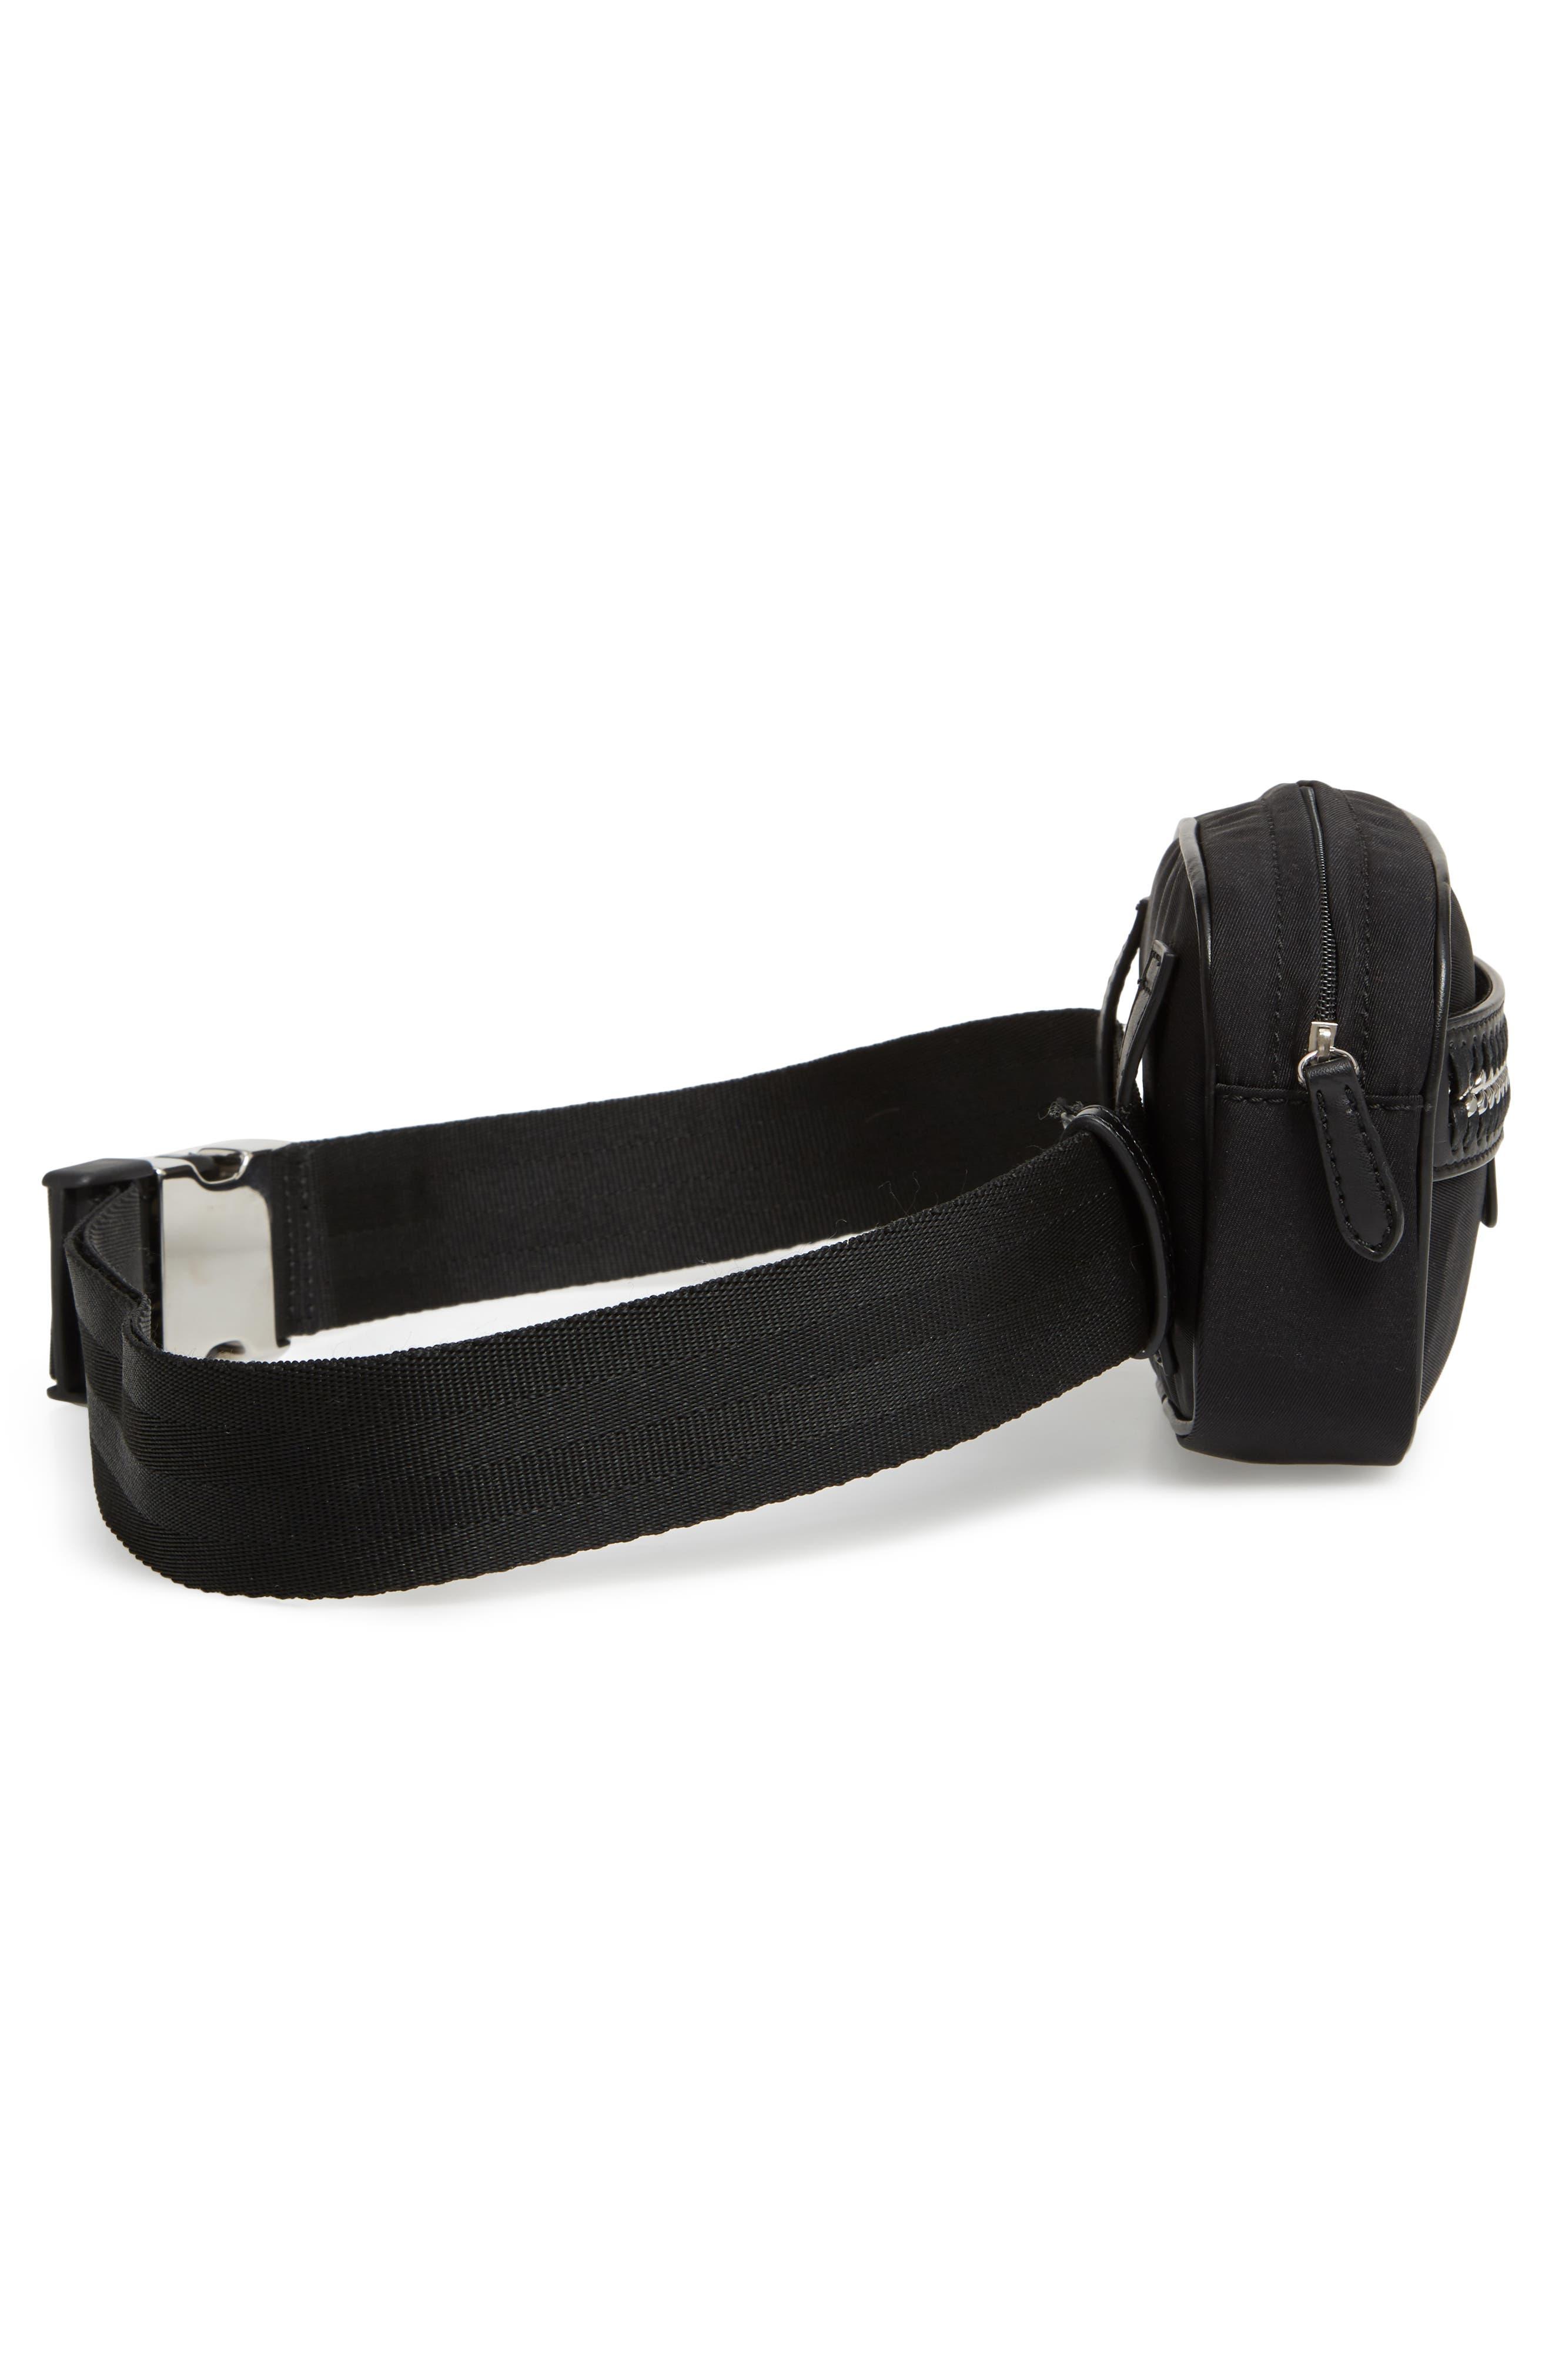 Nylon Convertible Belt Bag,                             Alternate thumbnail 6, color,                             BLACK/ SILVER